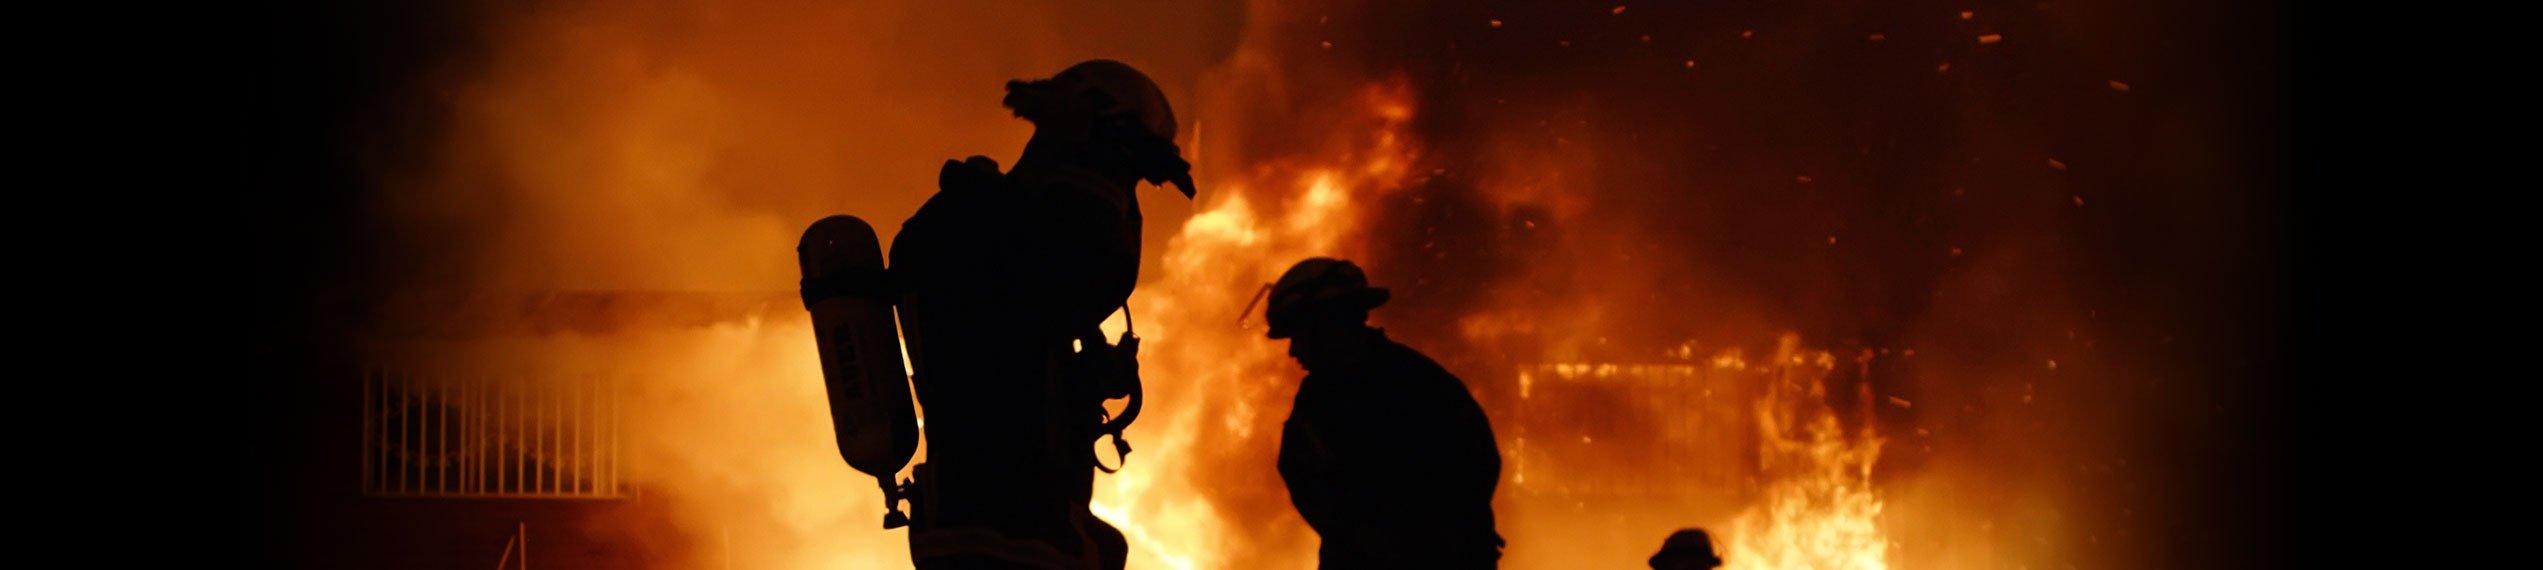 Fire & Smoke Damage Removal in Paul Davis Restoration of St Augustine